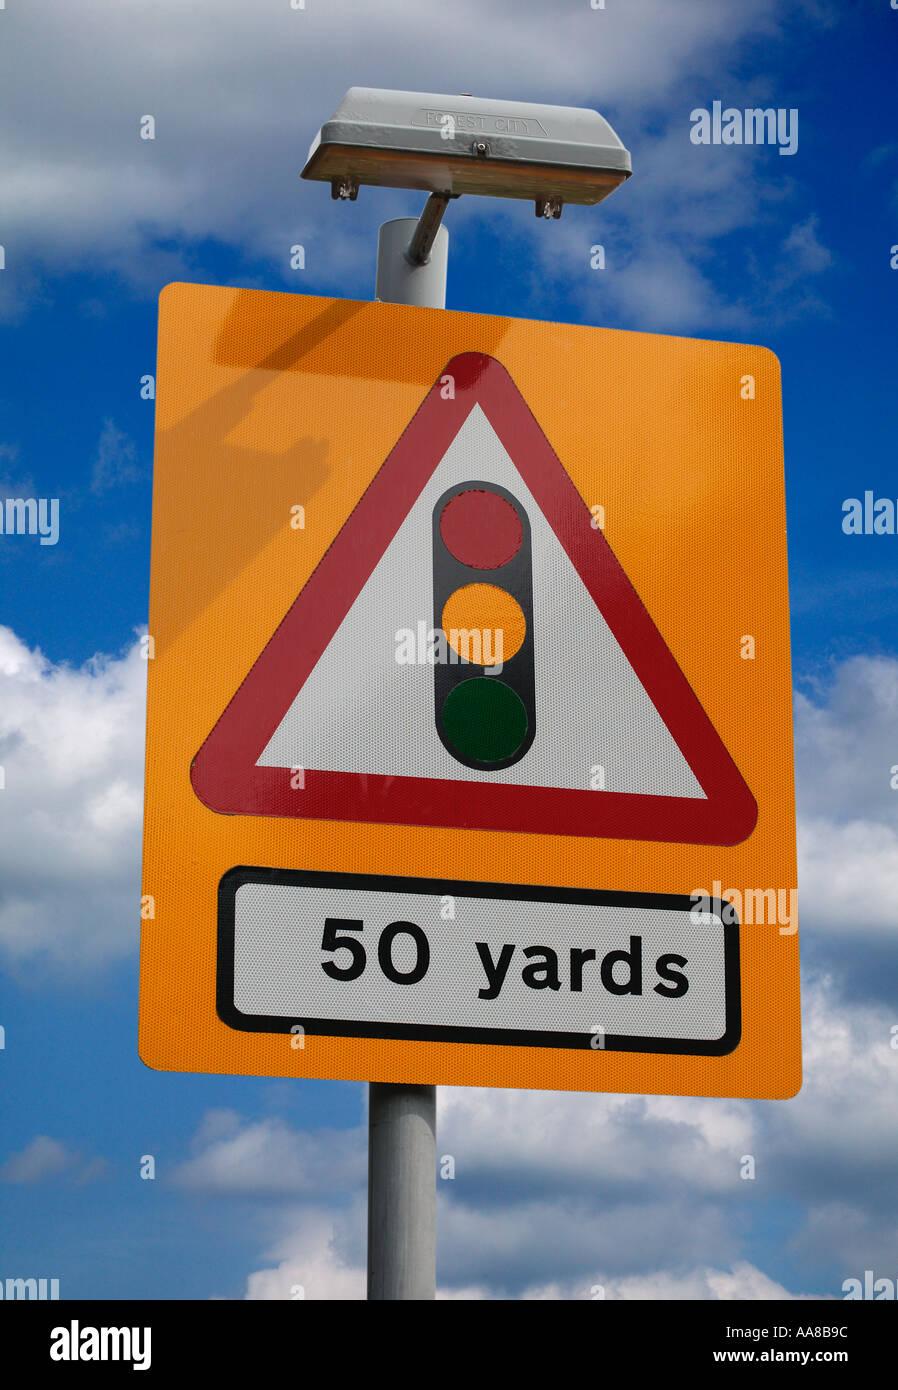 ROAD TRAFFIC LIGHT WARNING SIGN FIFTY YARDS ENGLAND UK - Stock Image